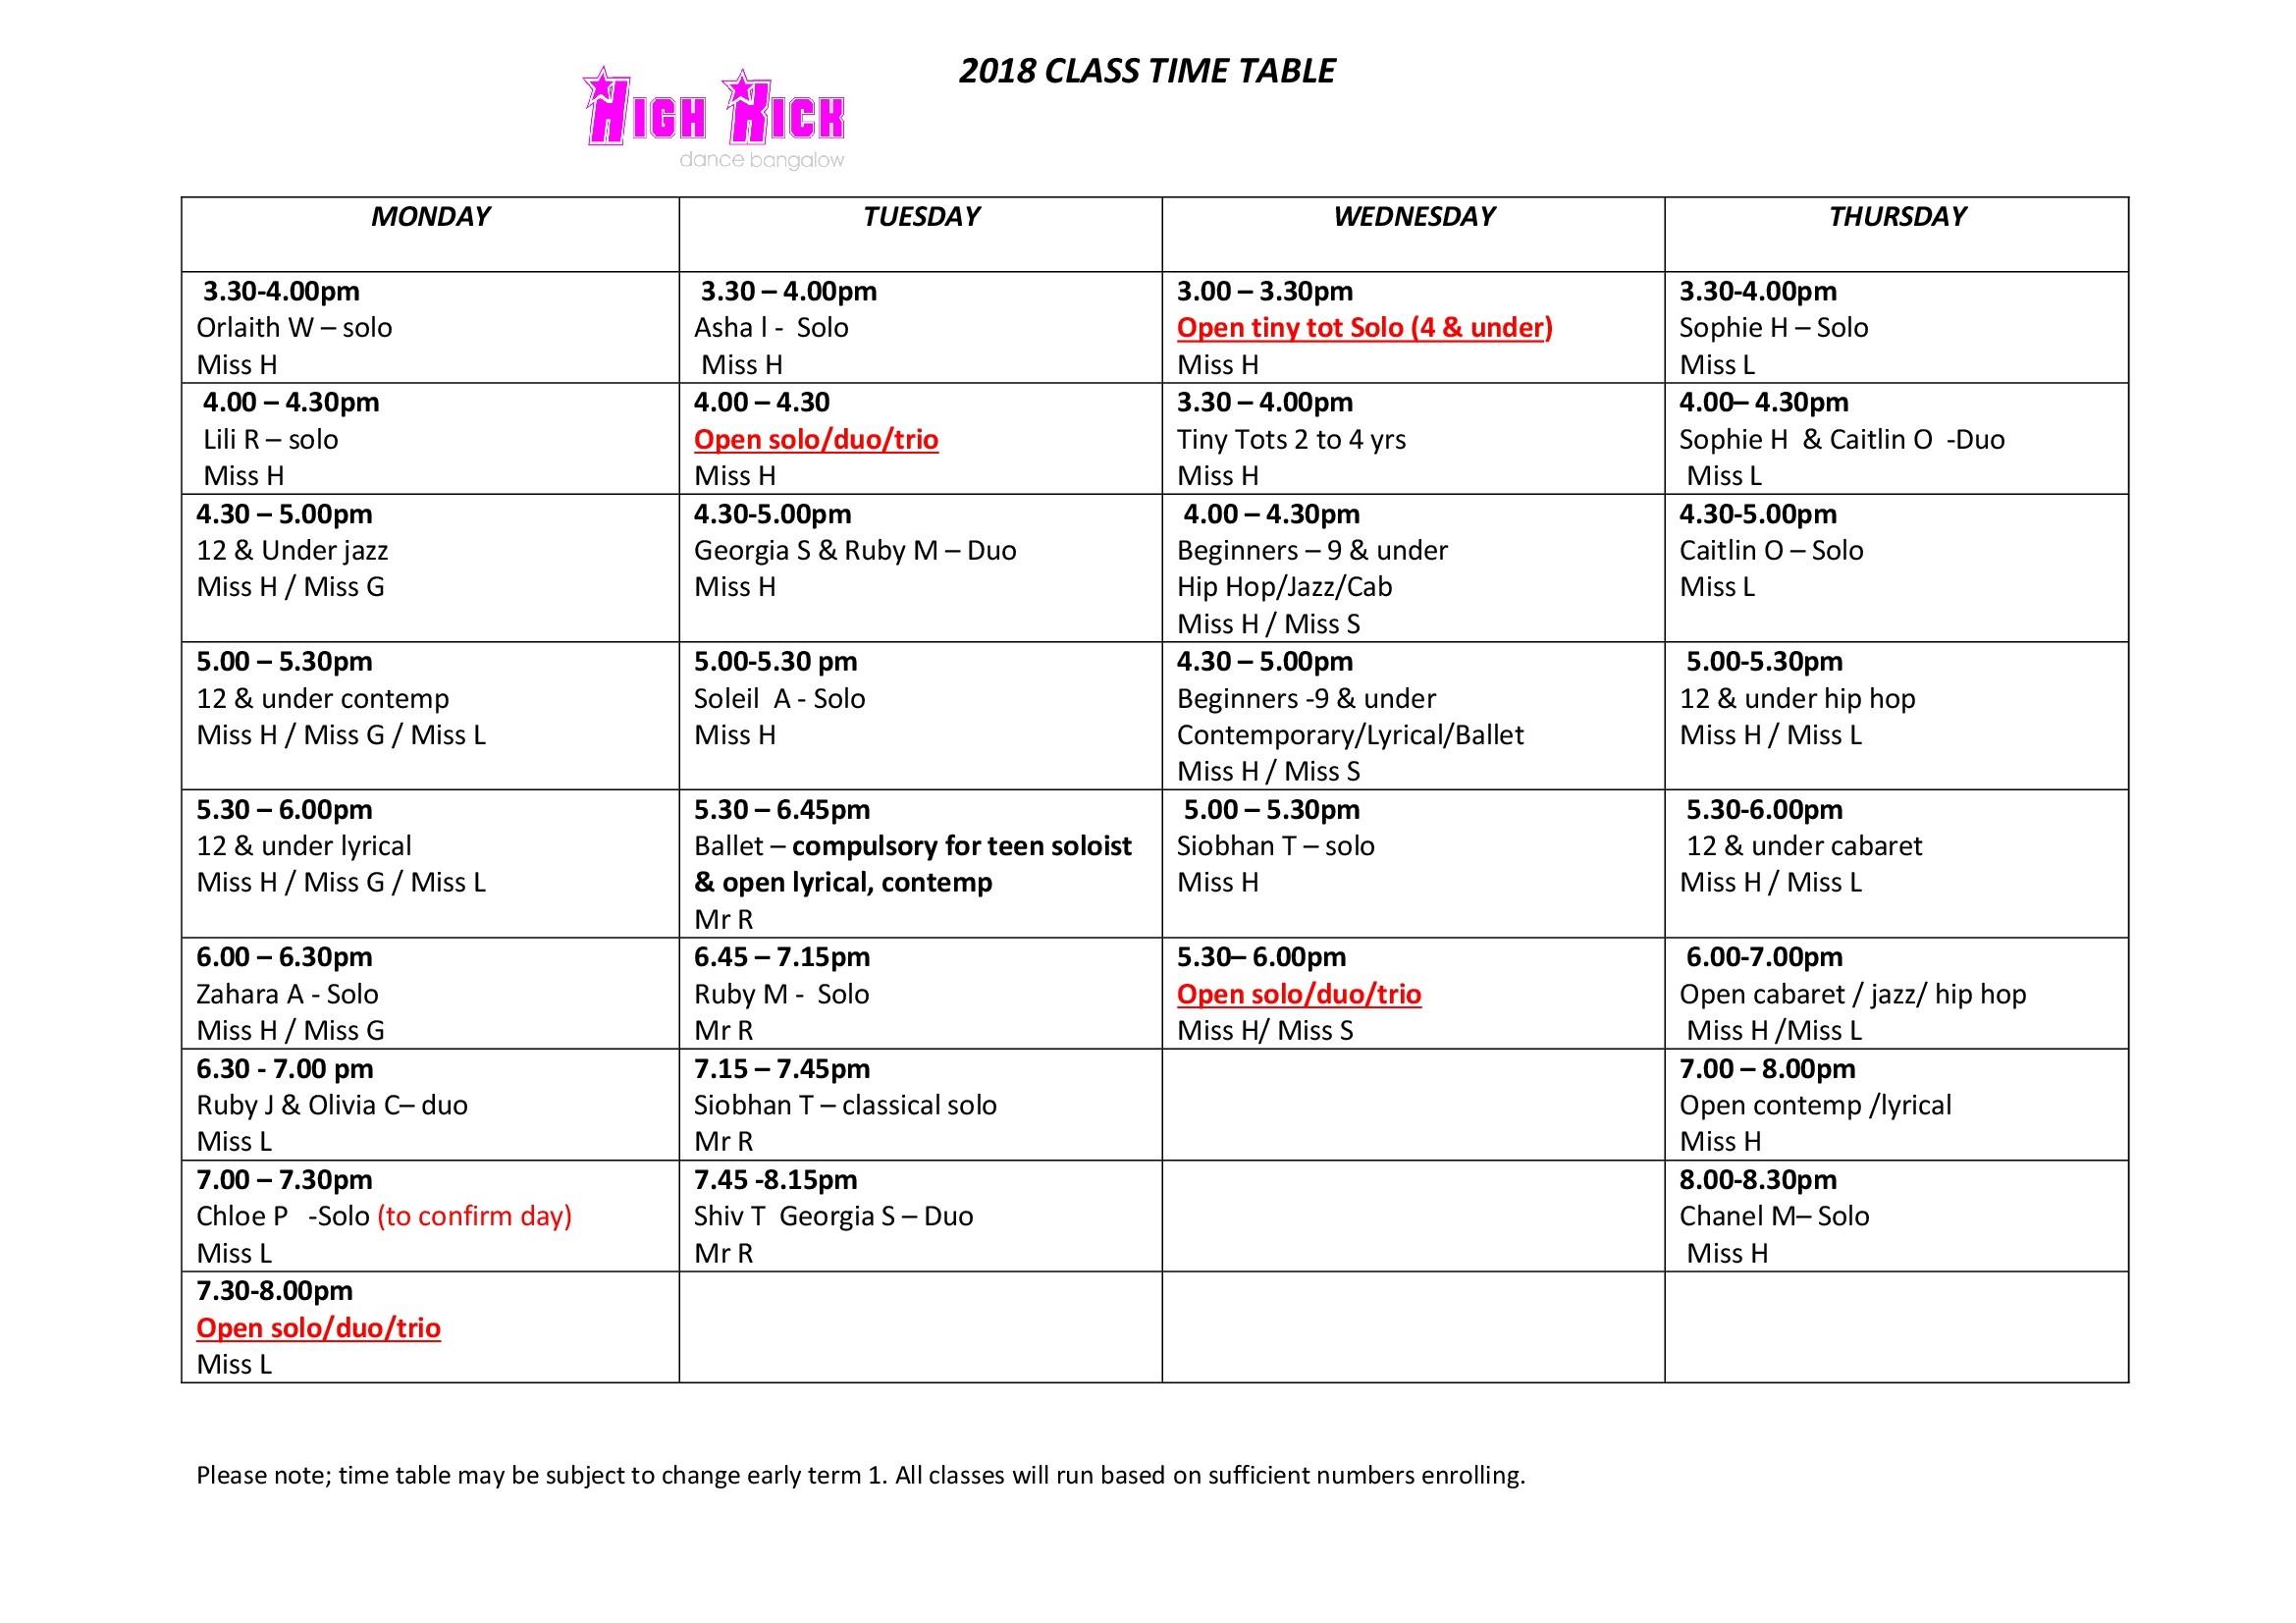 High Kick Bangalow Timetable 2018